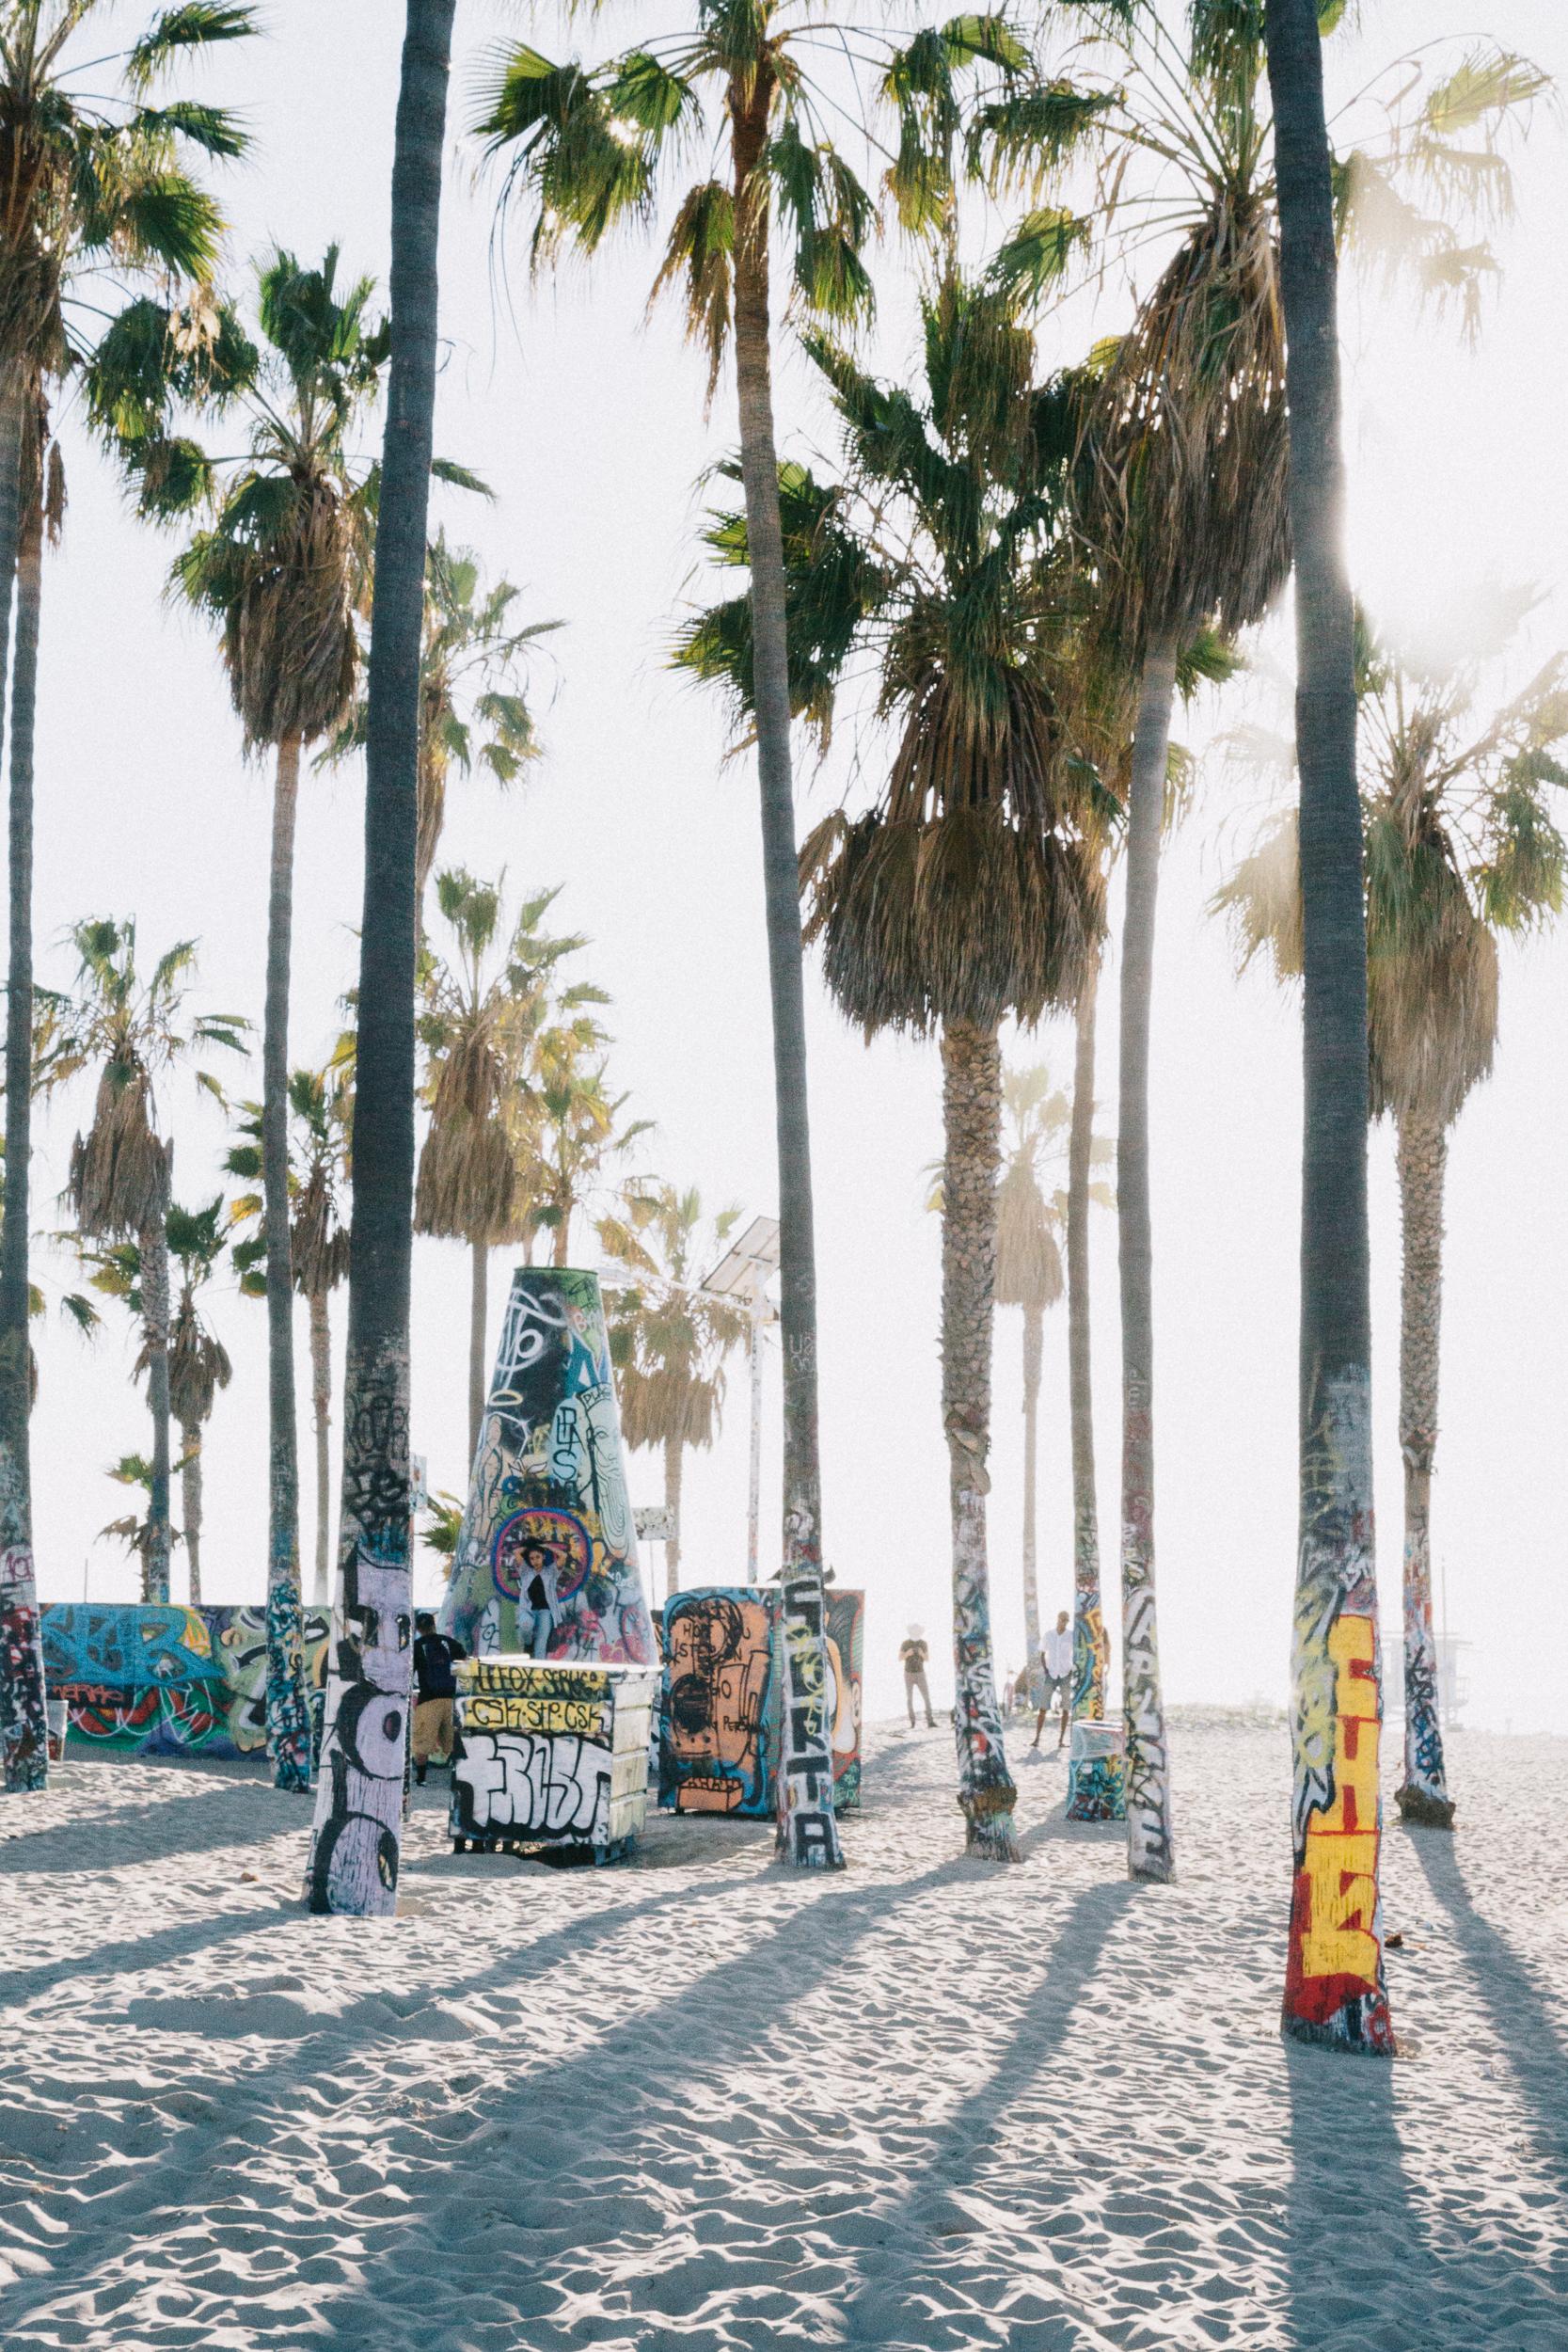 Los_Angeles_Travel_Photography_Laura_Suprenant-3.jpg